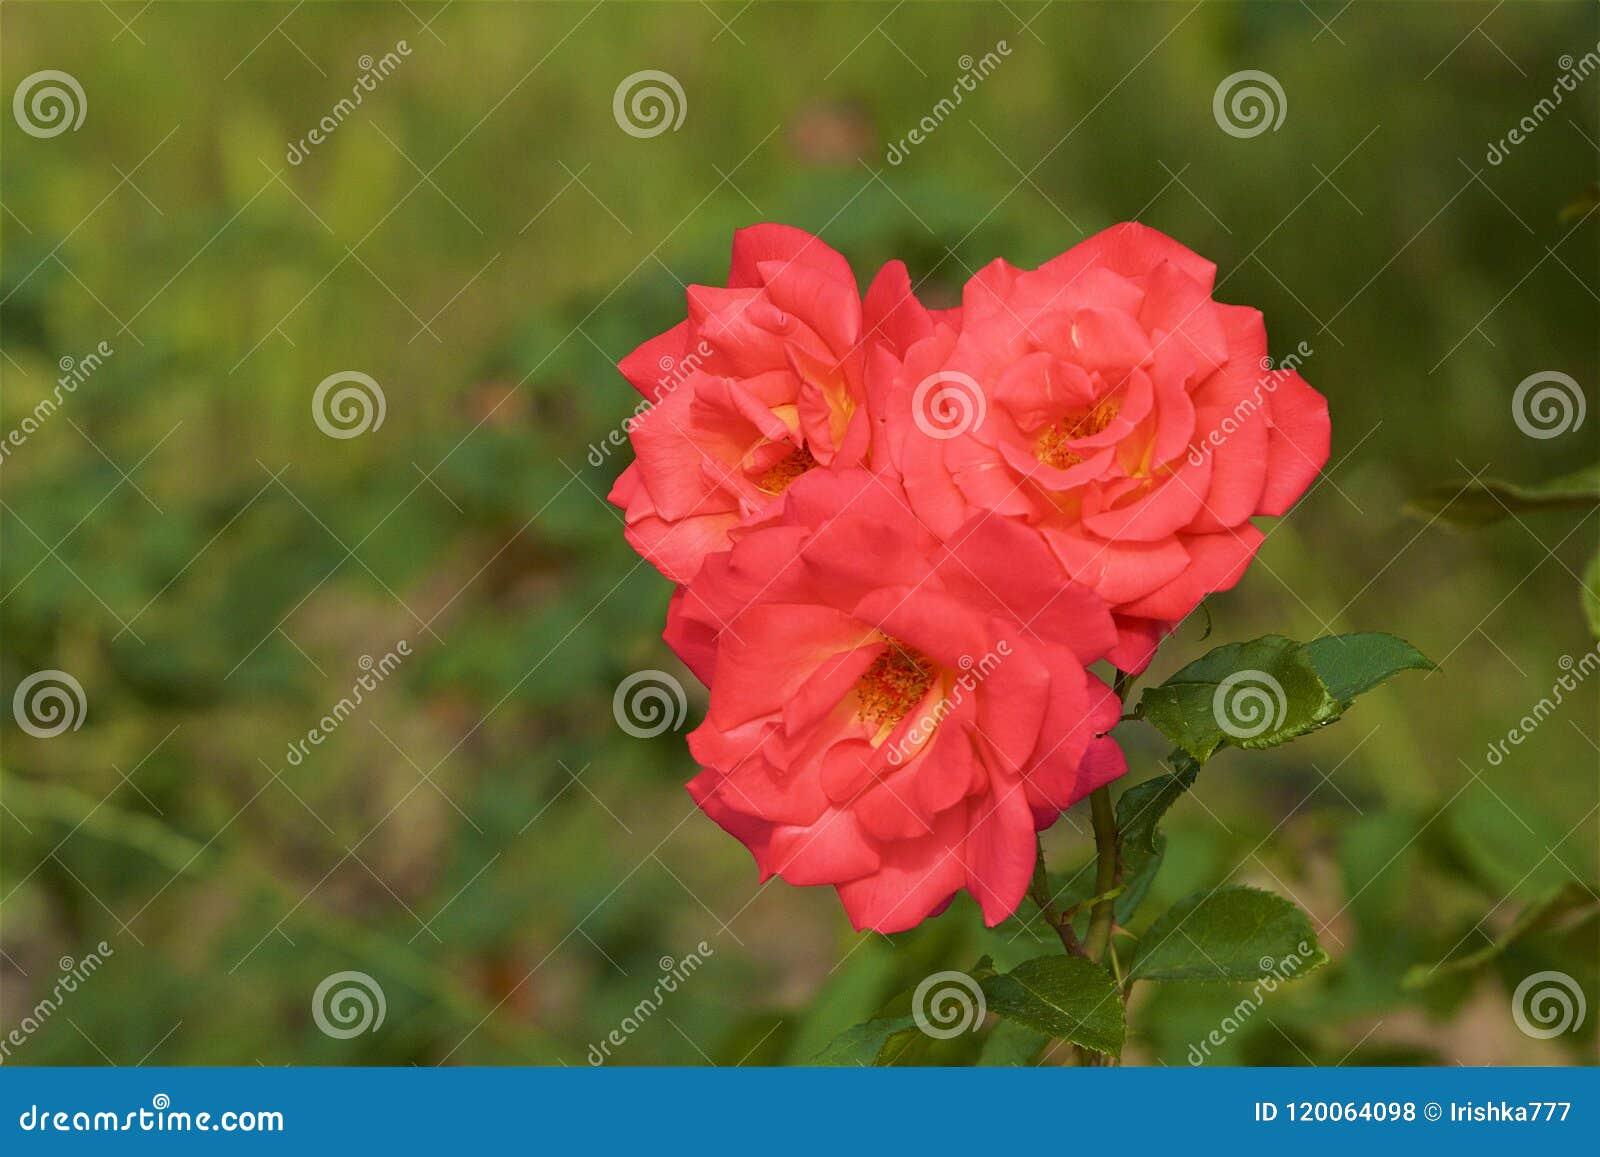 Rose bush in botanical garden